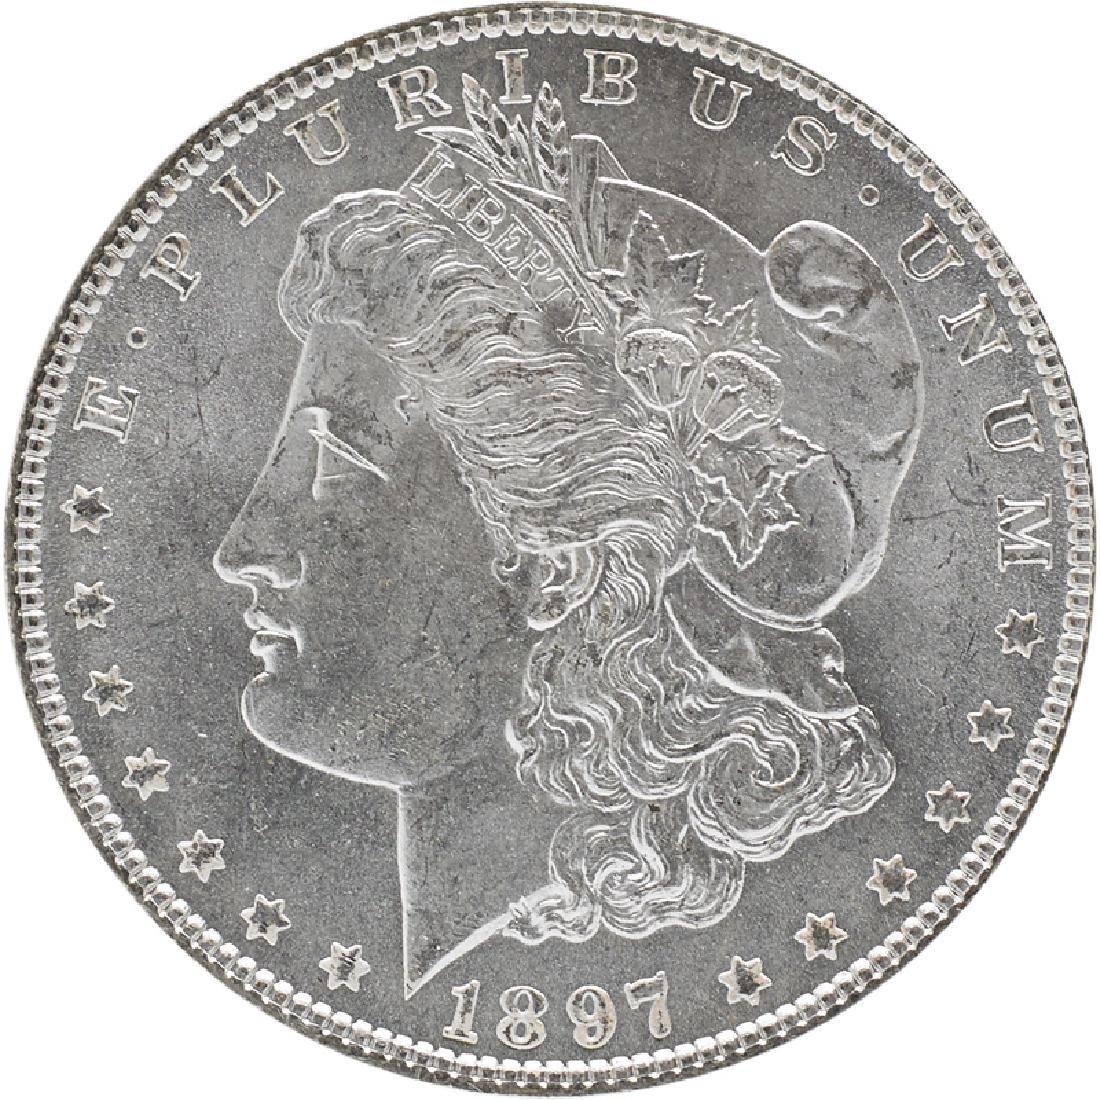 U.S. 1897 MORGAN $1 COIN